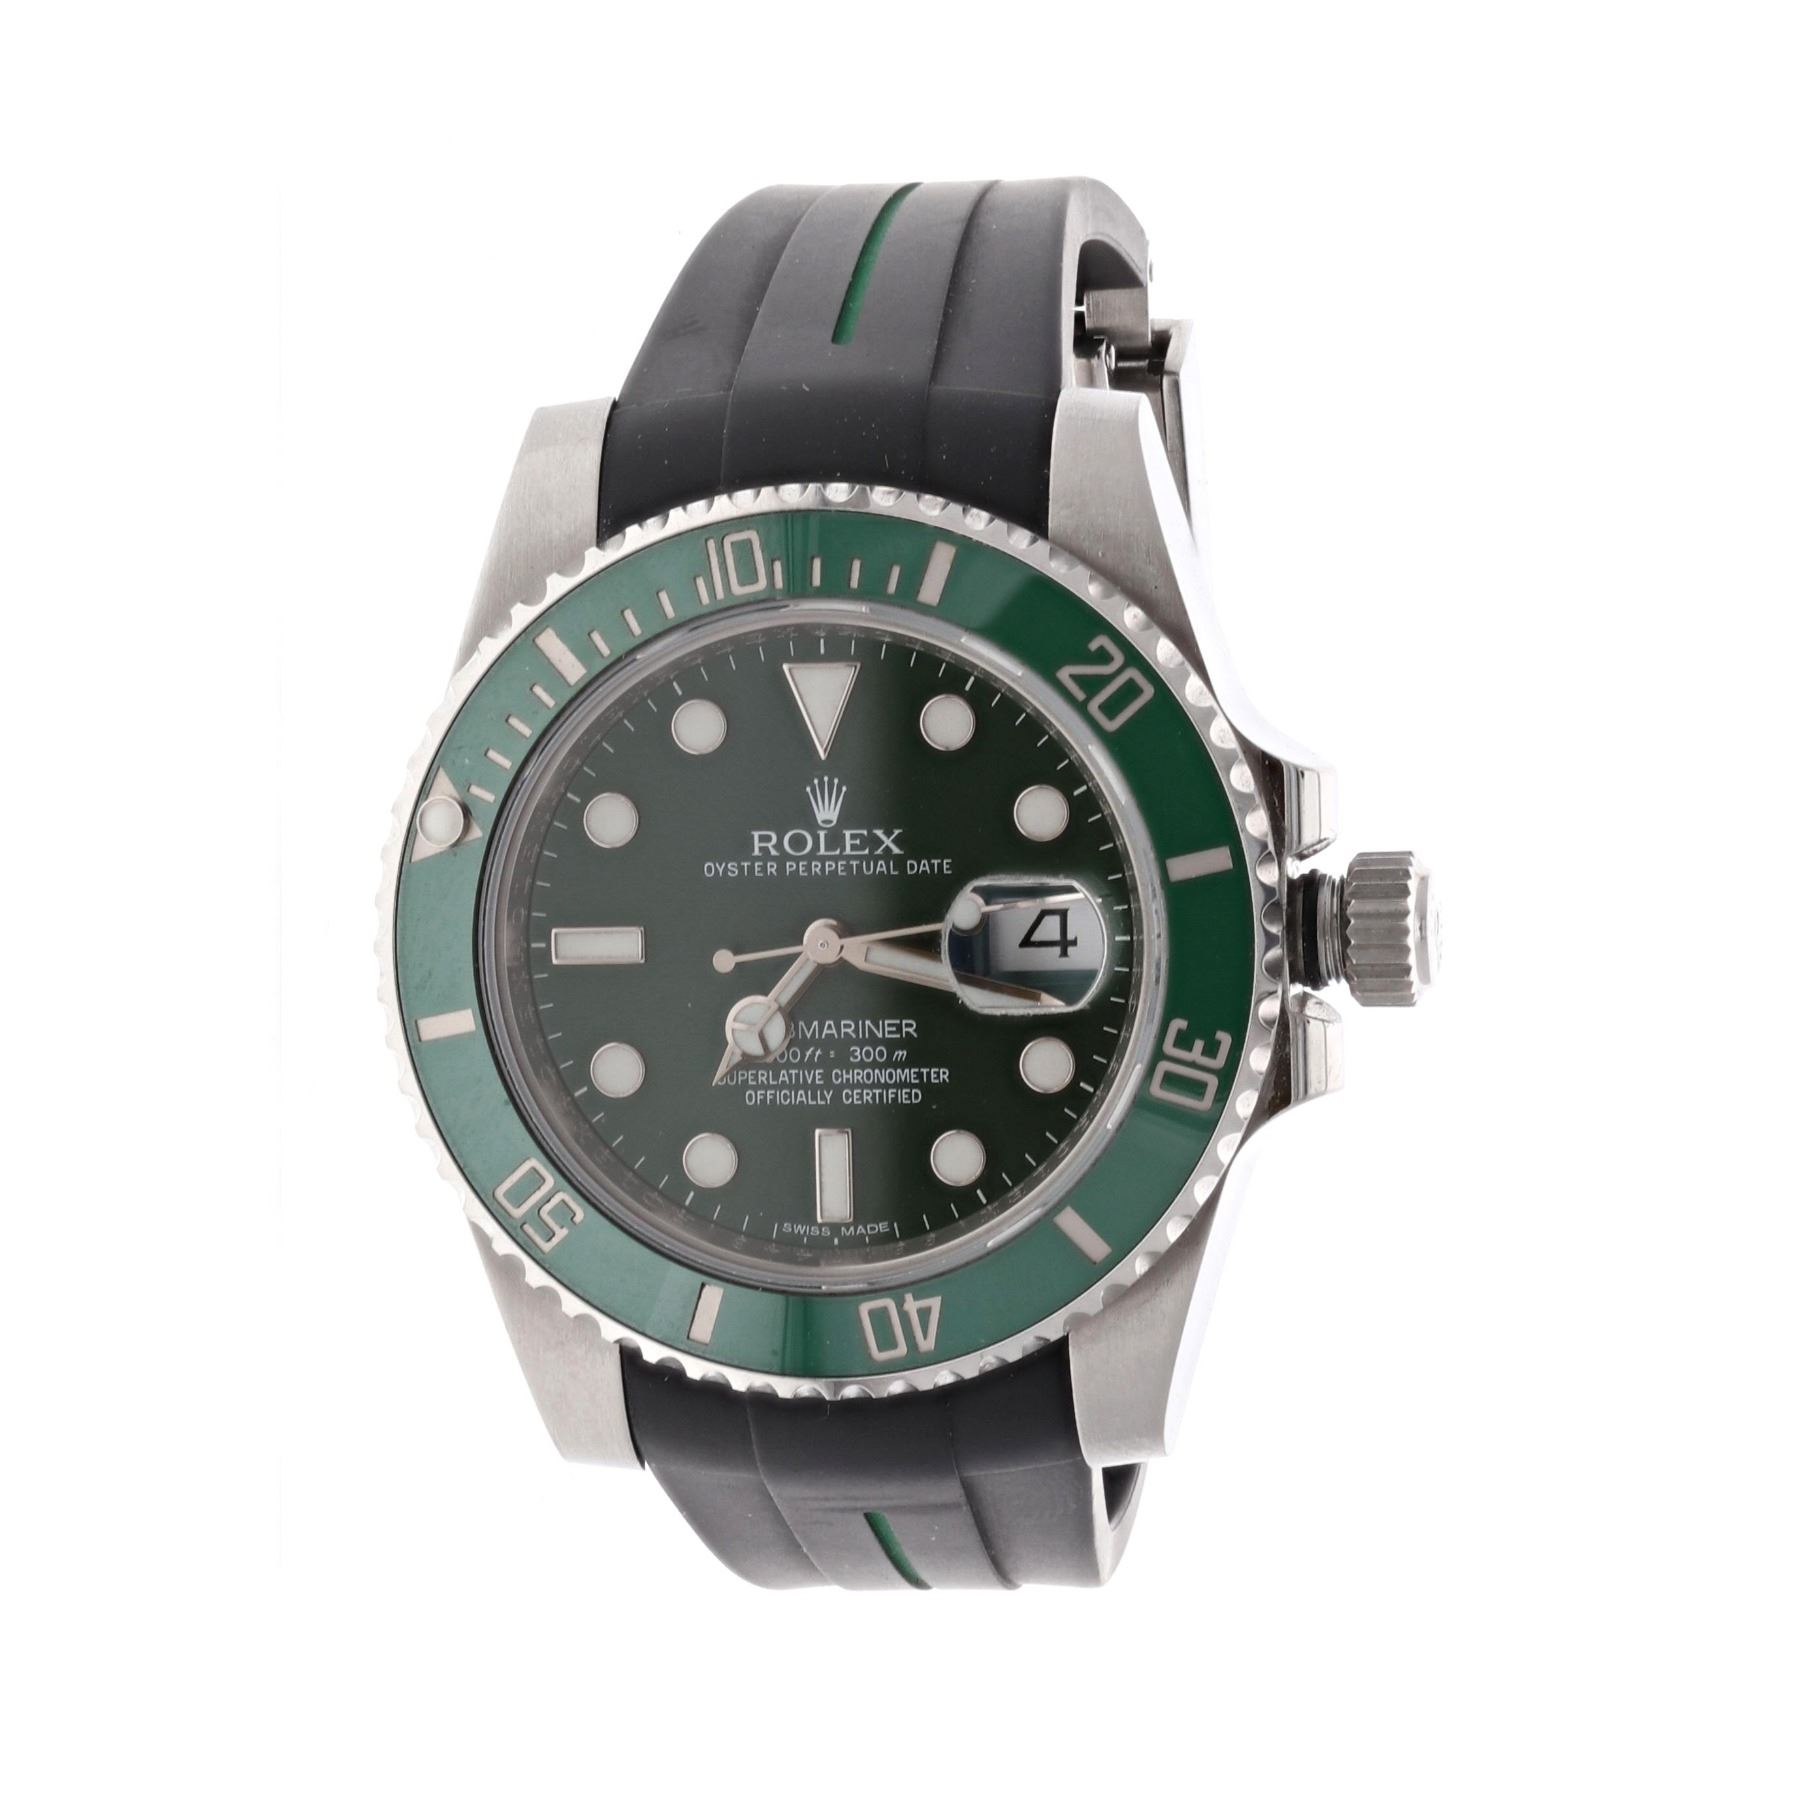 ROLEX [1] Stainless steel Rolex Submariner Date watch; 40mm case, green  dial, green uni,directional